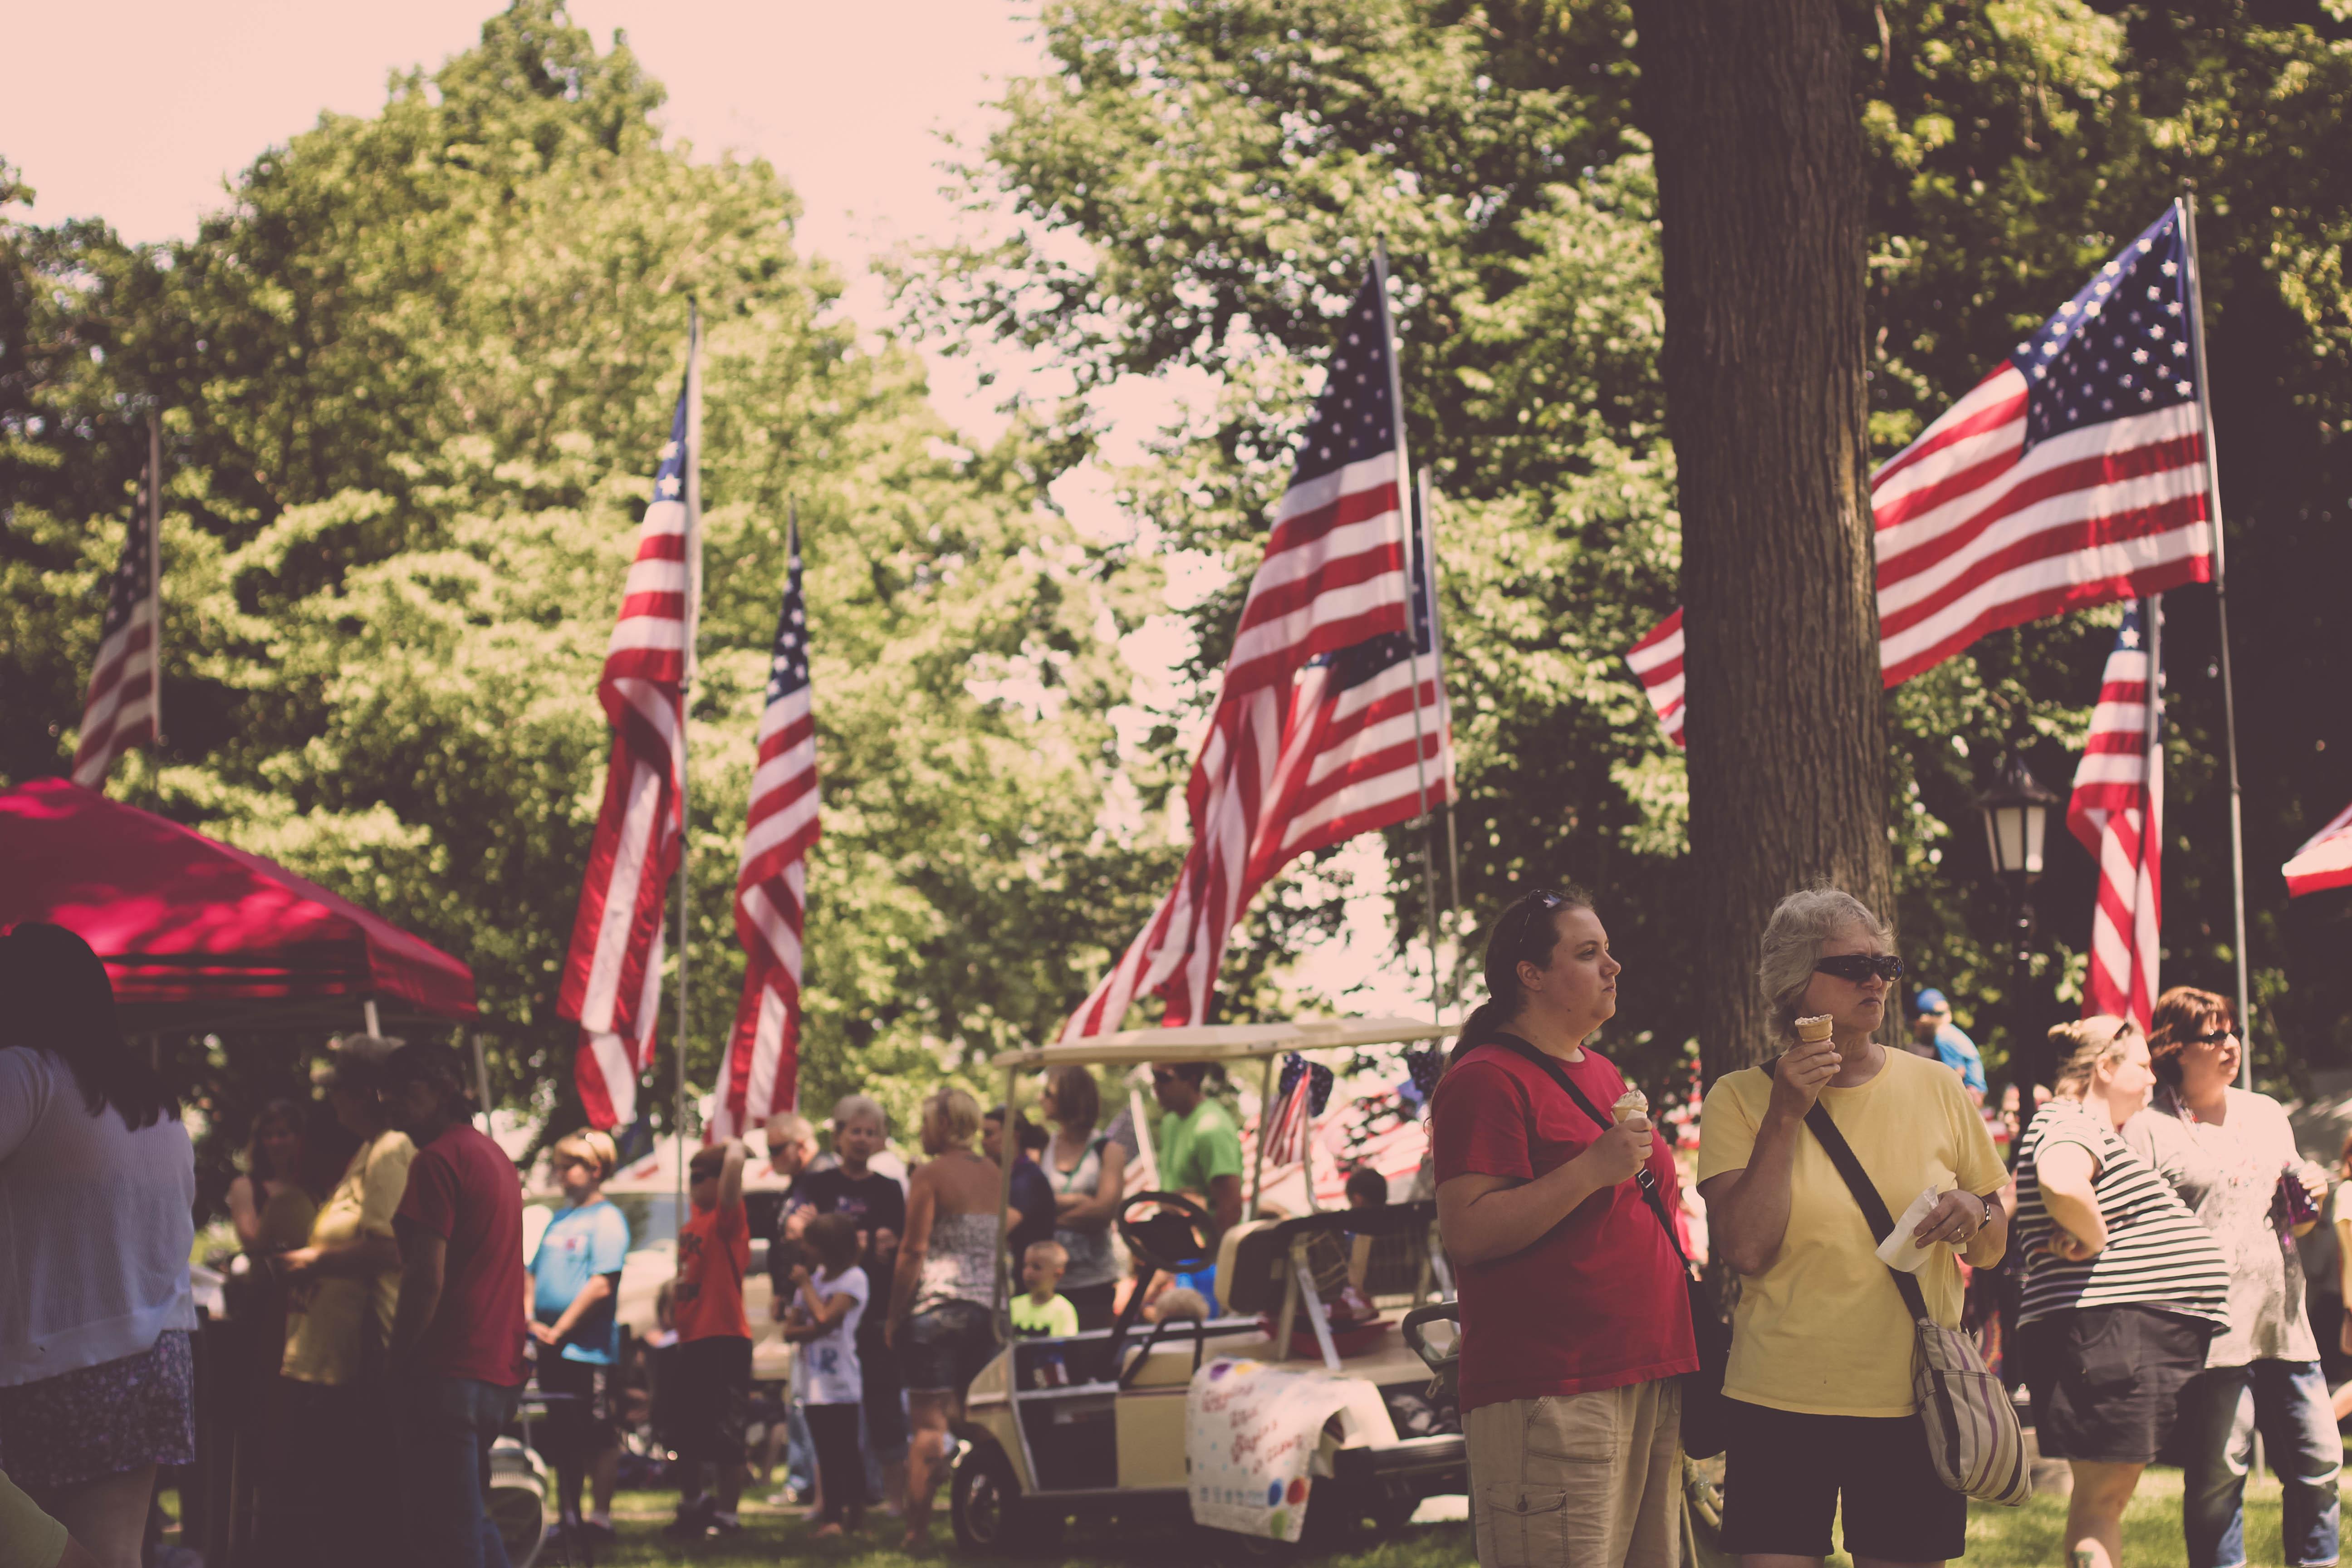 day 26 // patriotism